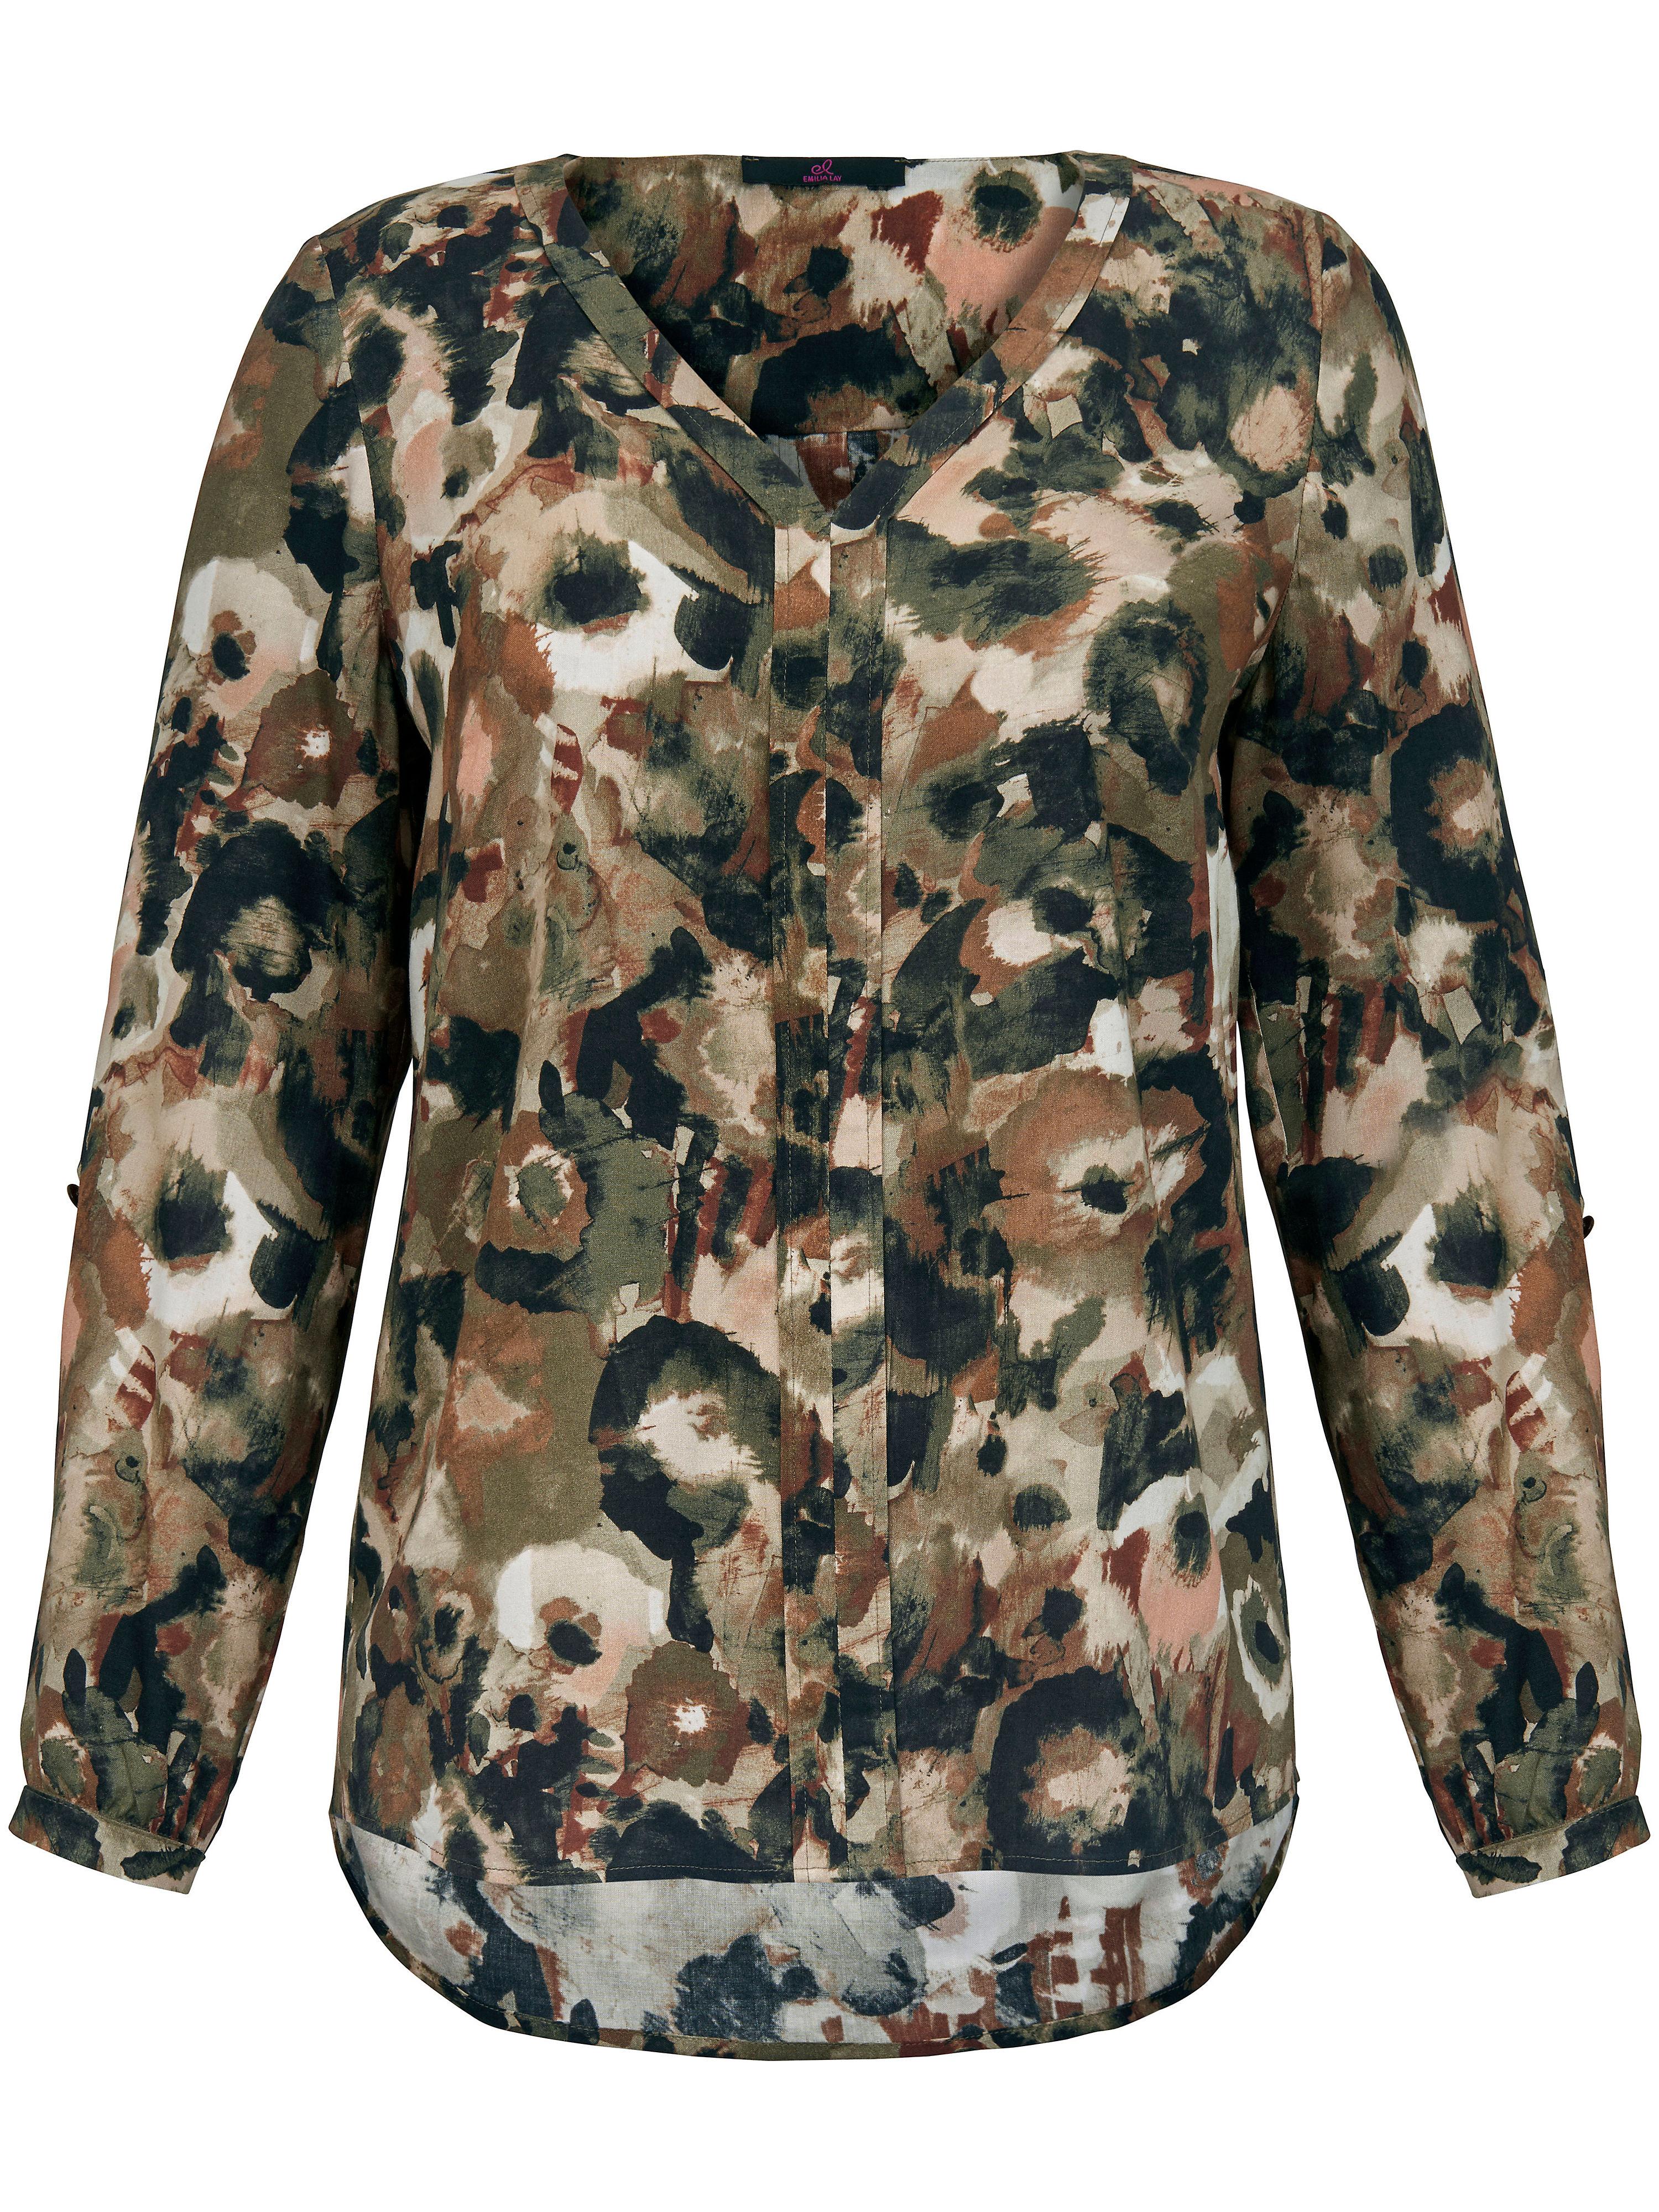 Schlupf-Bluse Emilia Lay mehrfarbig | Bekleidung > Blusen > Schlupfblusen | Print | Emilia Lay